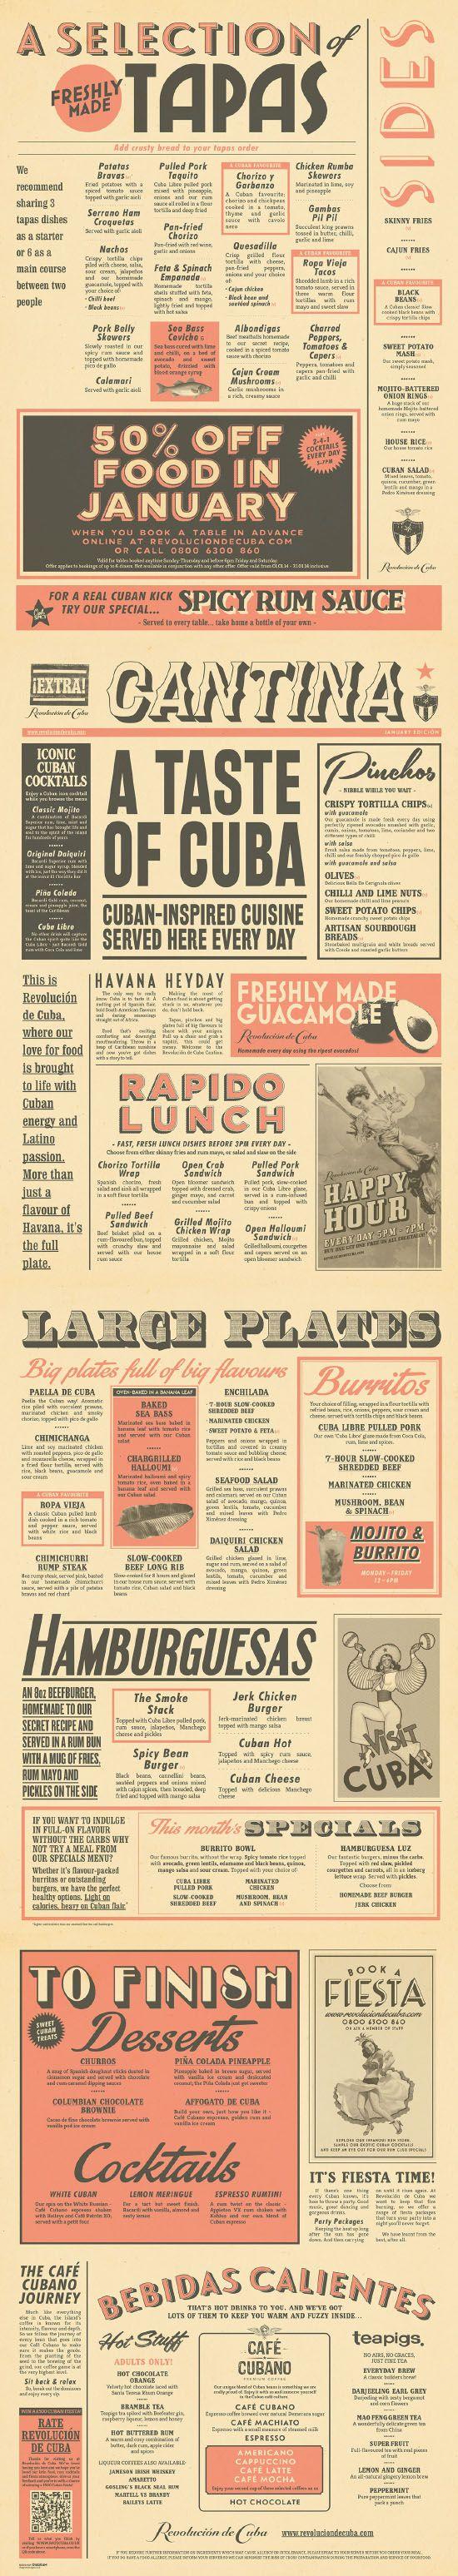 Cuban Cantina Food Menu Graphic Design for Revolucion de Cuba by www.diagramdesign.co.uk